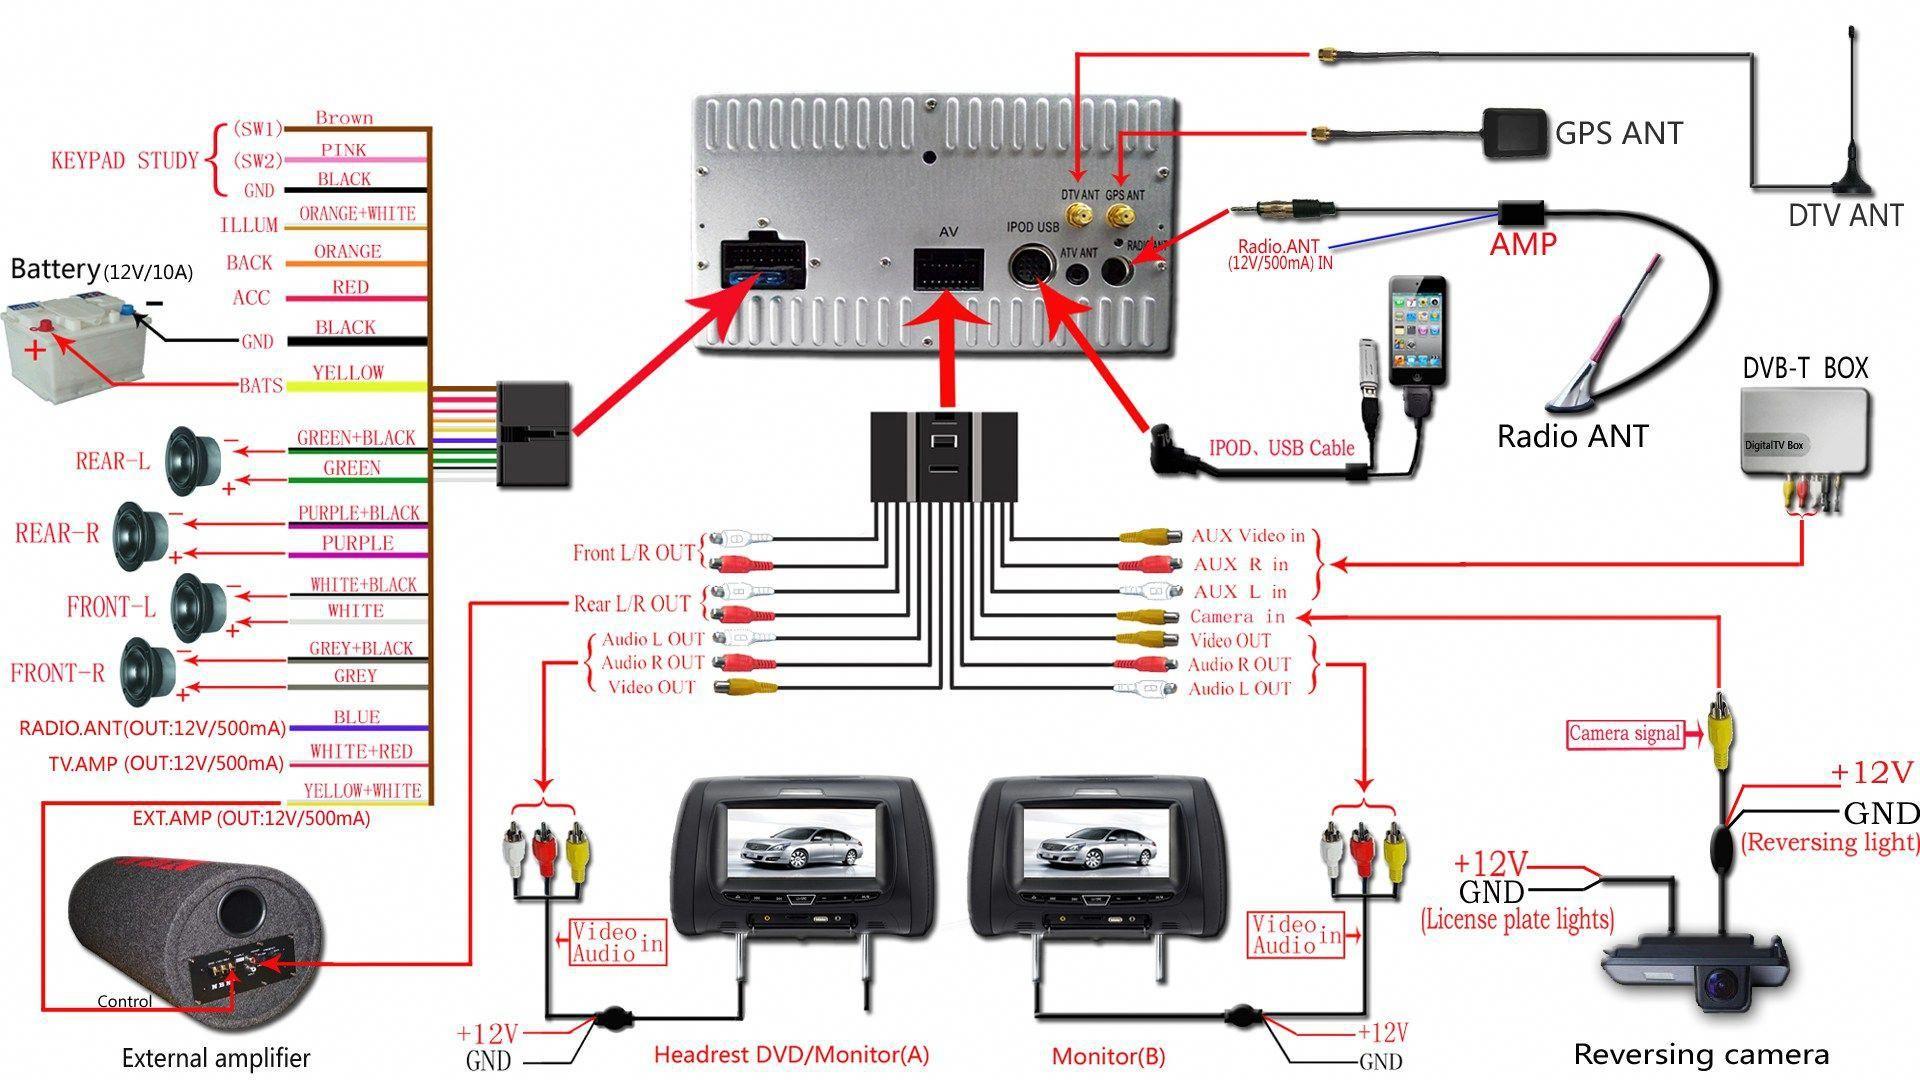 Pin By Simple Media Decor On Media Room Designs Car Stereo Car Audio Car Audio Systems